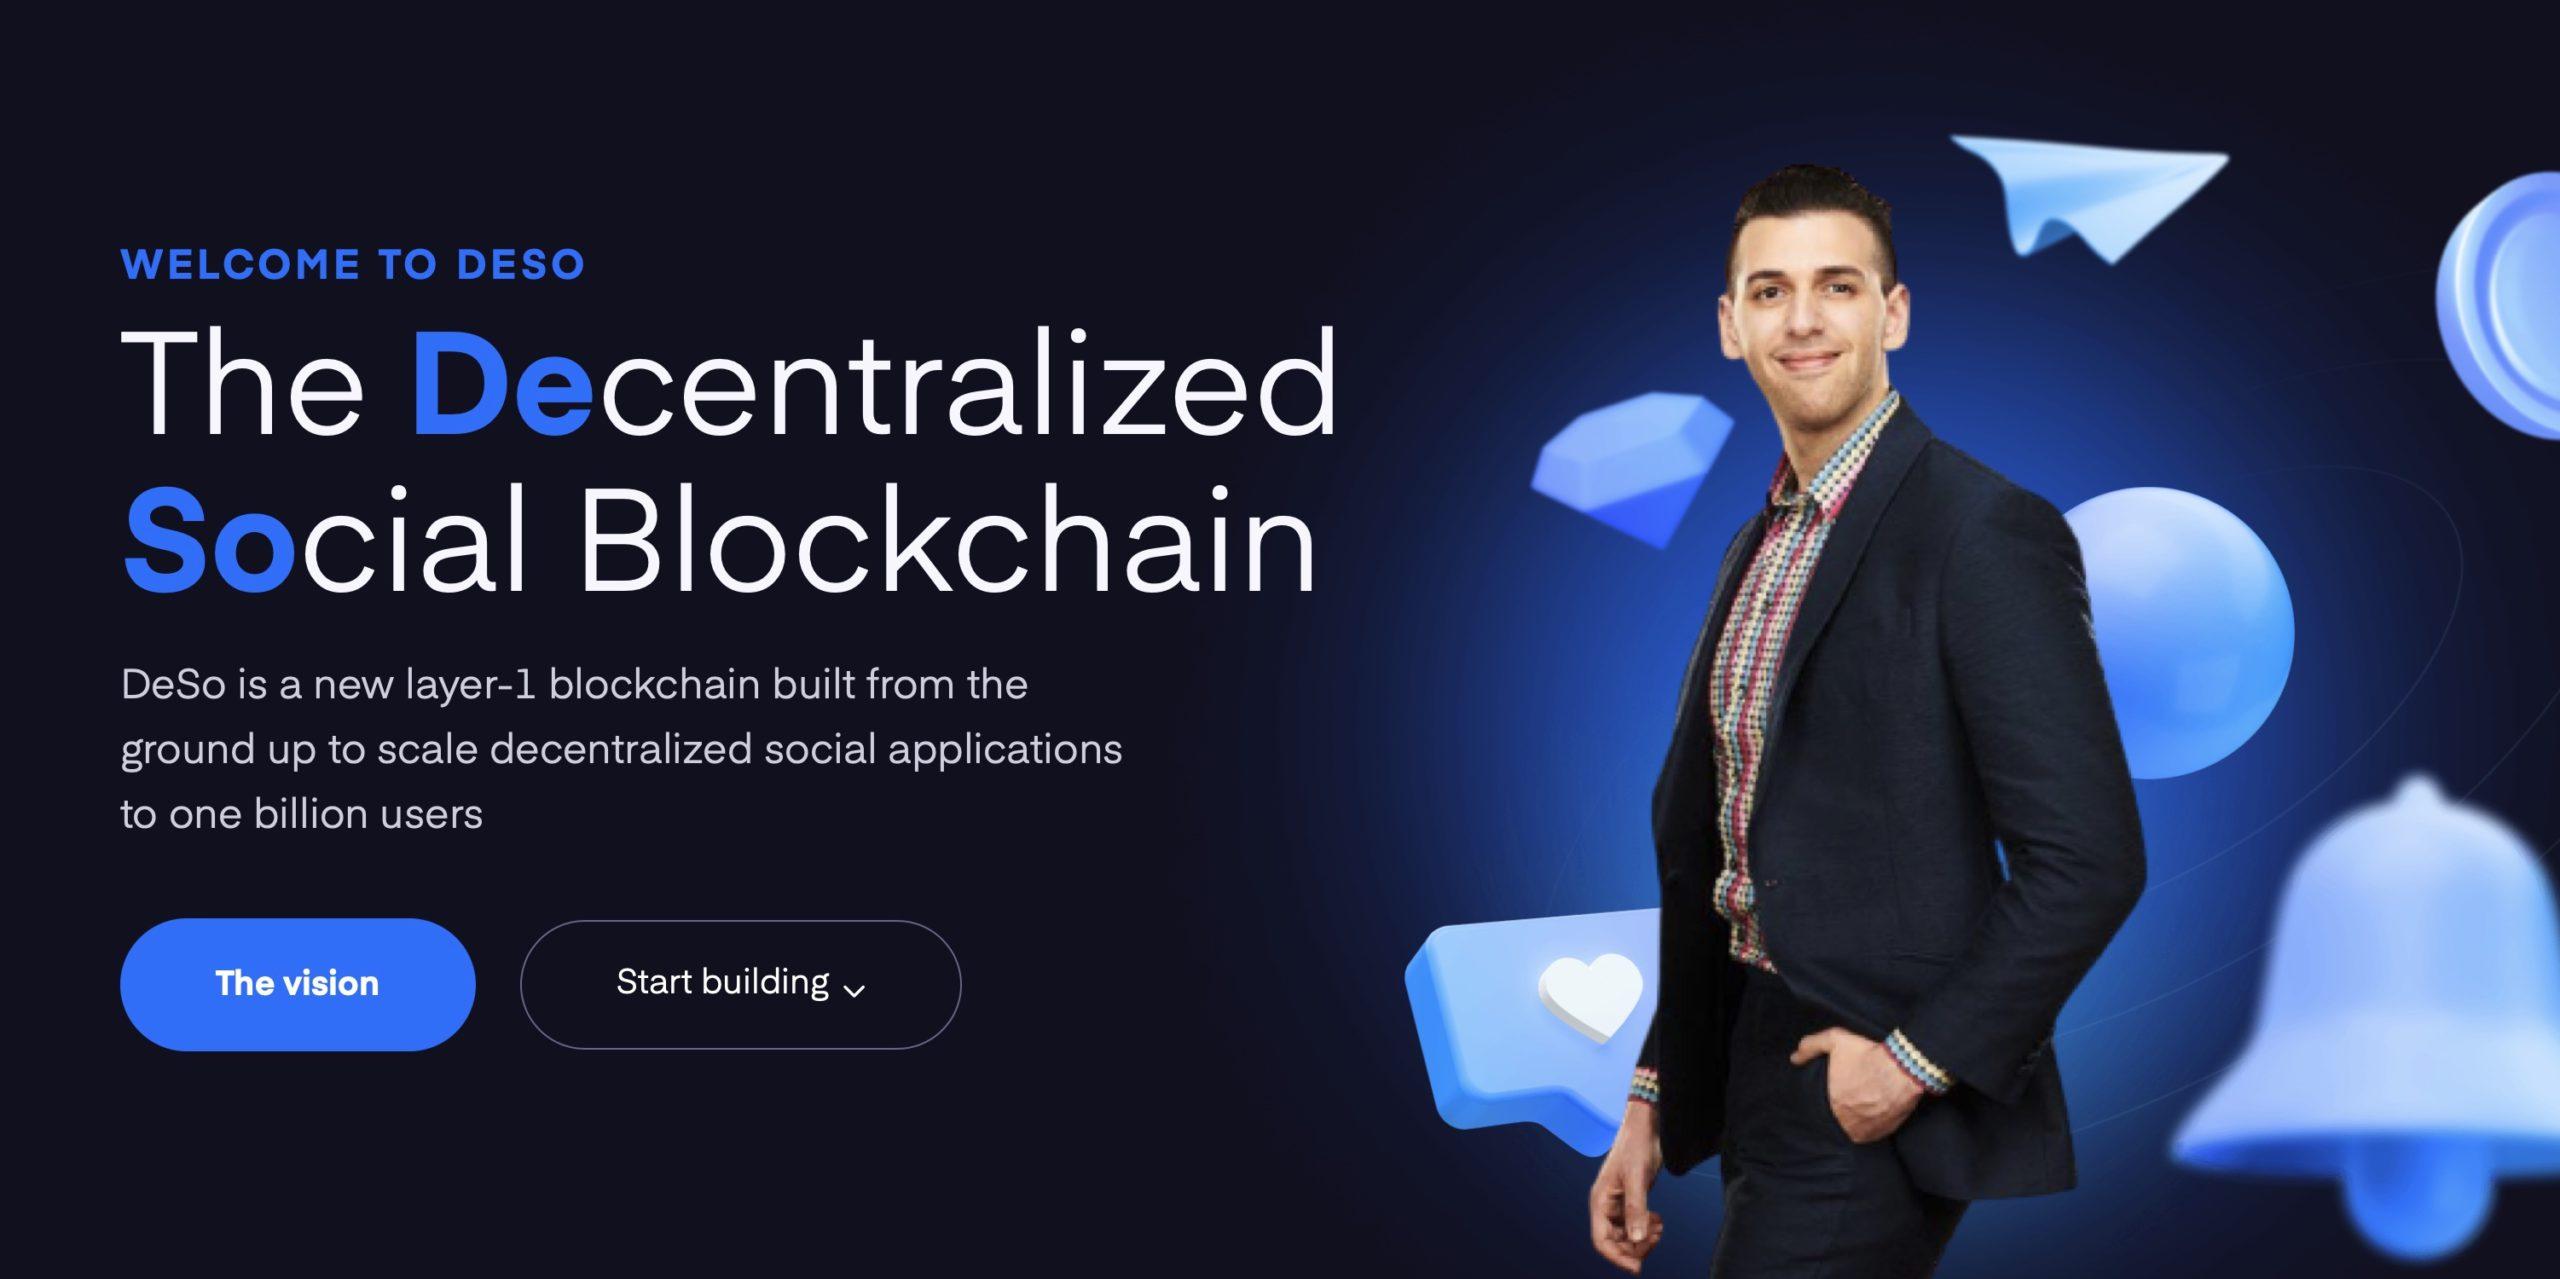 BitClout 創辦人推「社群區塊鏈 DeSo」,獲 2 億美元投資、a16z 紅杉參投